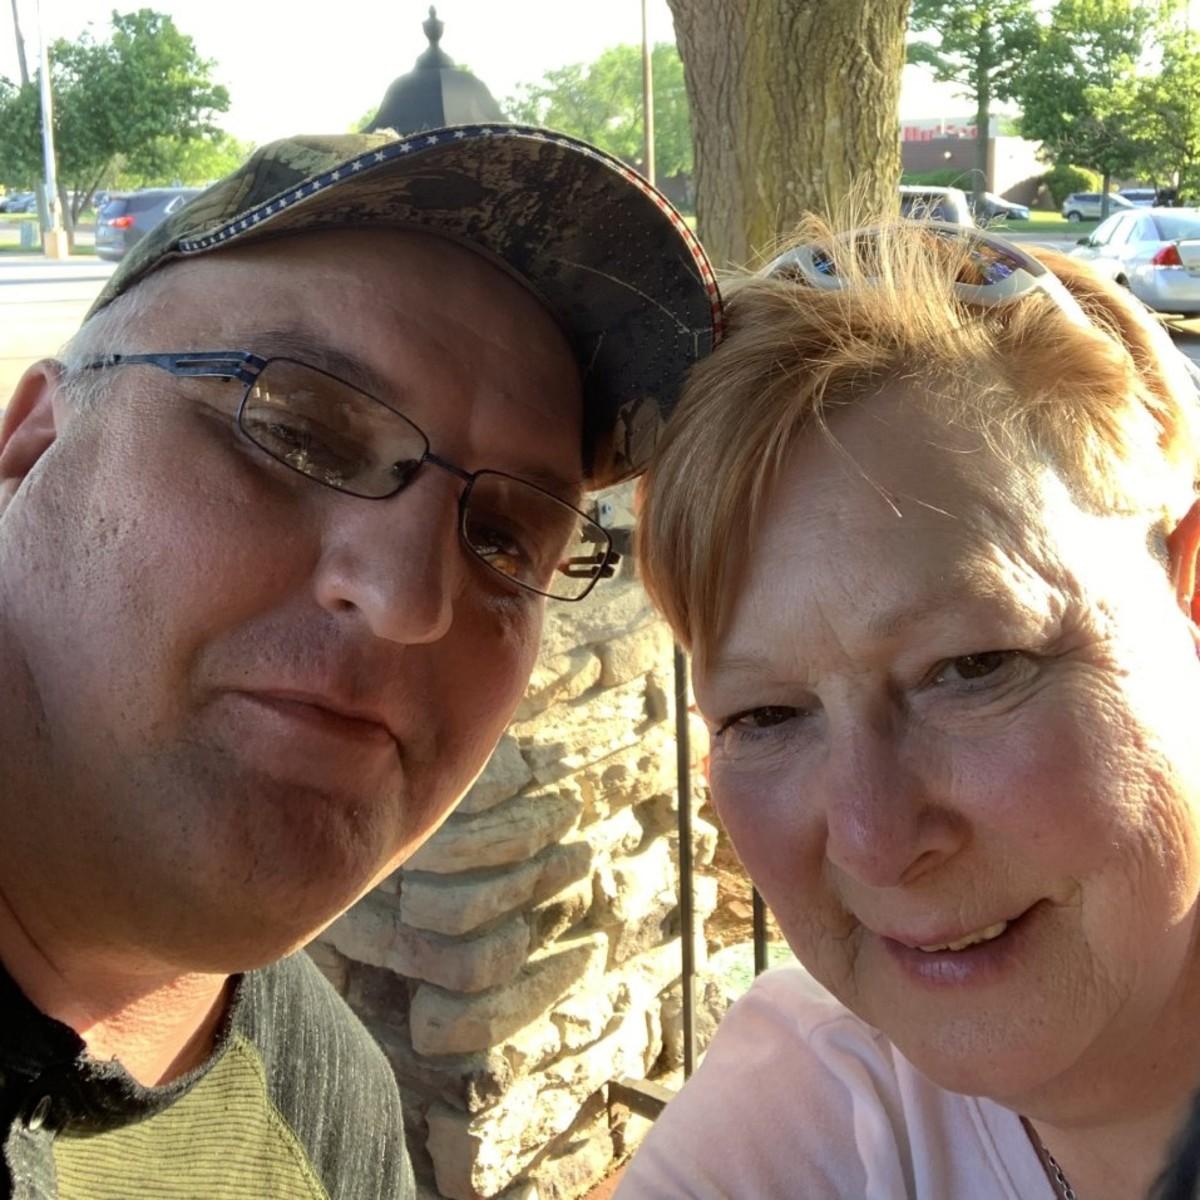 Jeff and Cindy Kamm